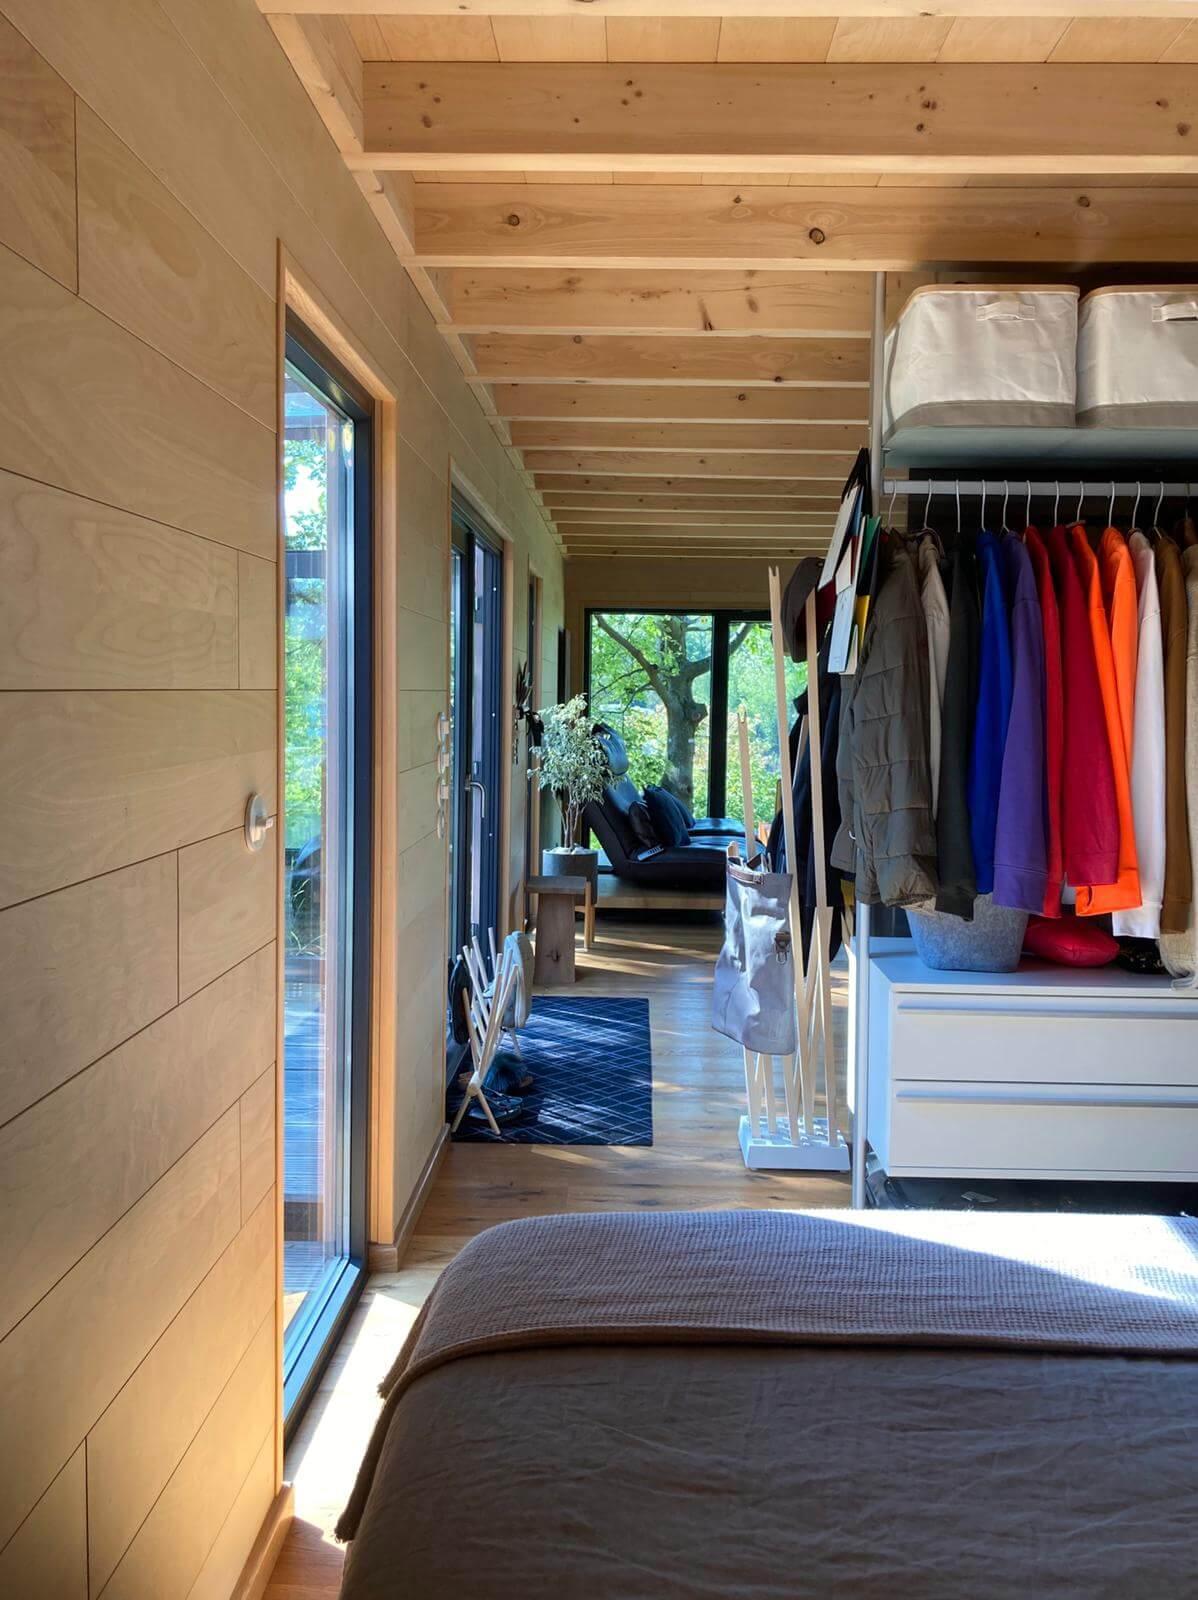 mobiles-chalet-norwegen-mobiles-tiny-house-16